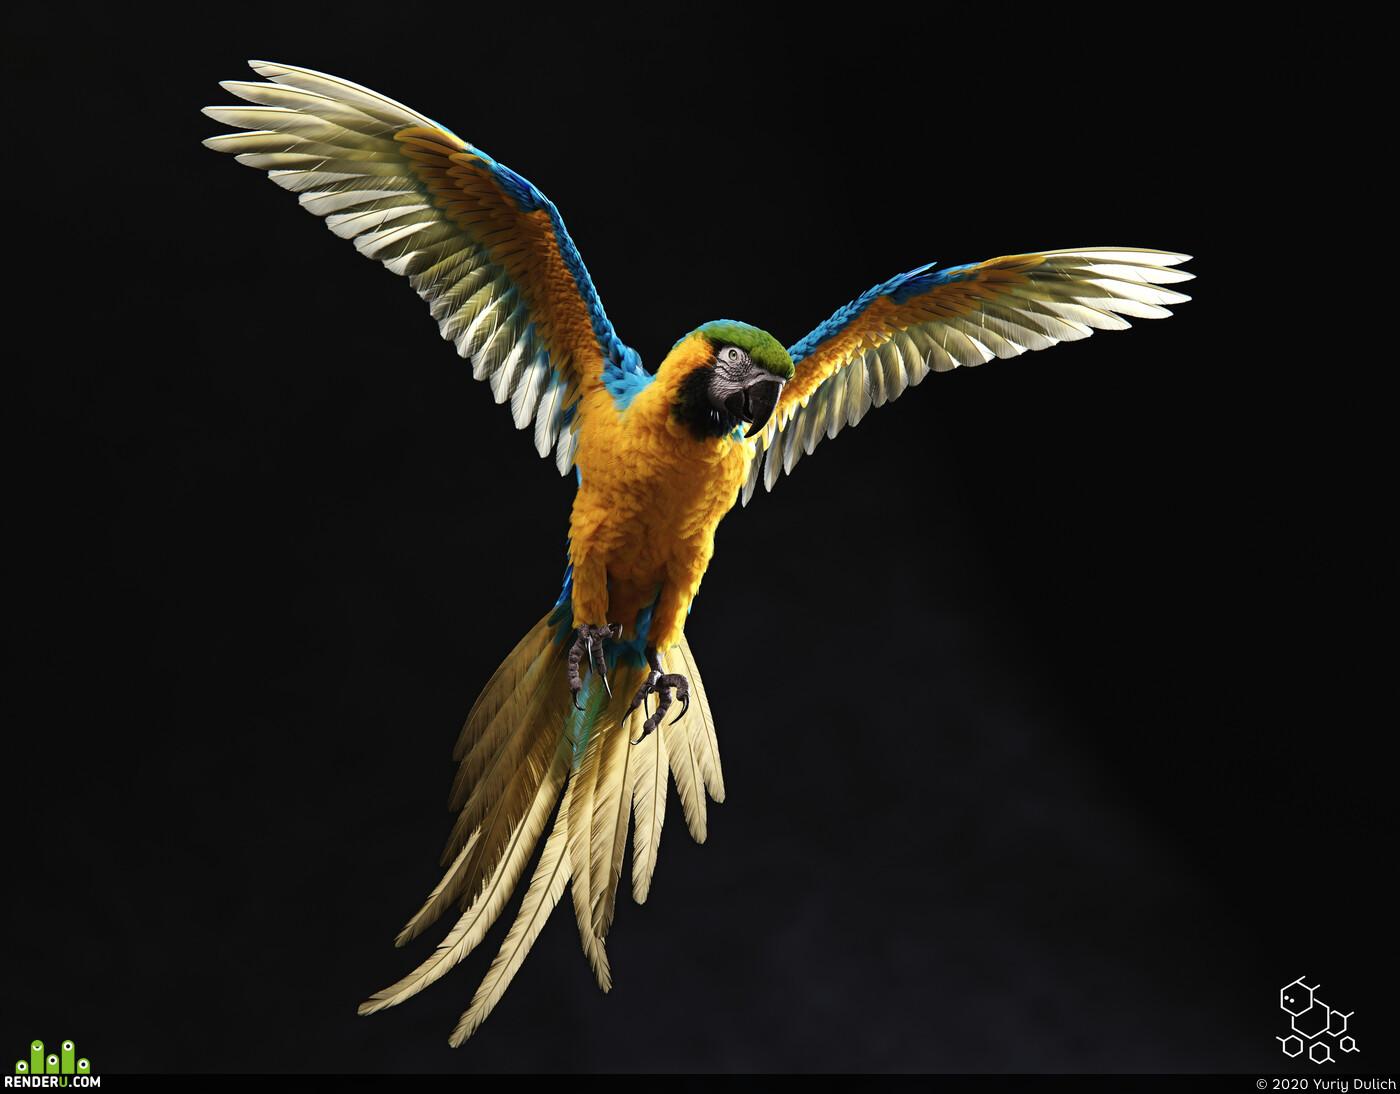 Попугай, ара, перья, фотореализм, груминг, 3д перя, животное, птица